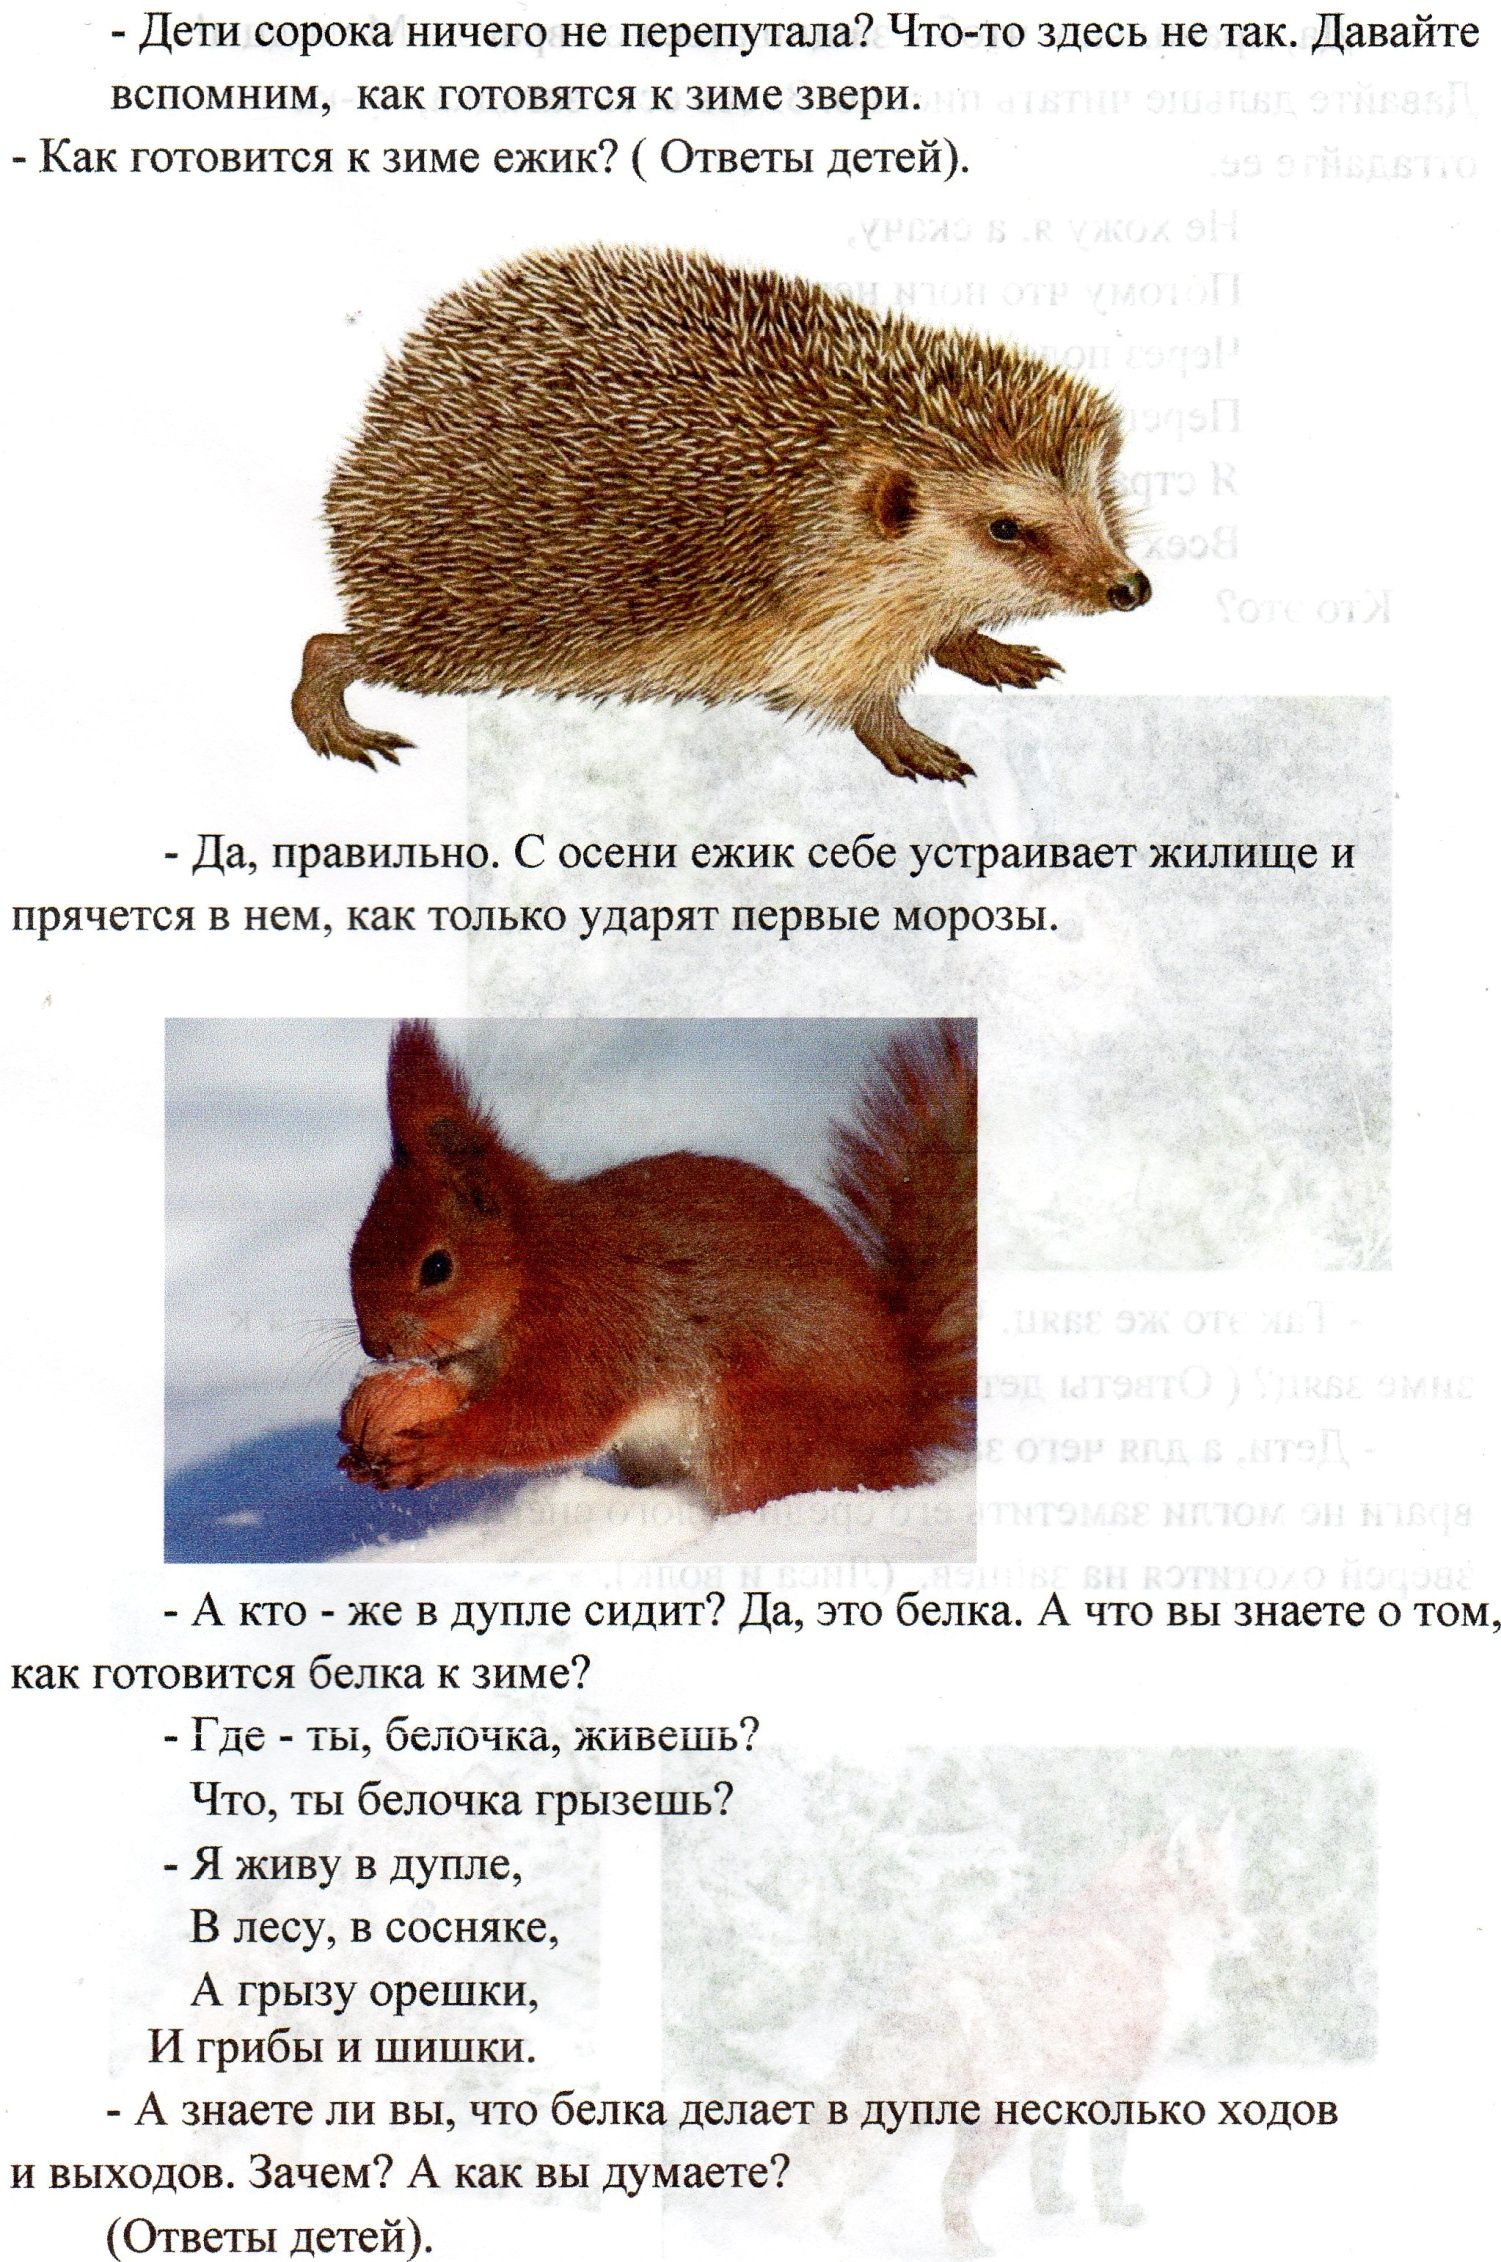 C:\Users\Александр\Pictures\img018.jpg